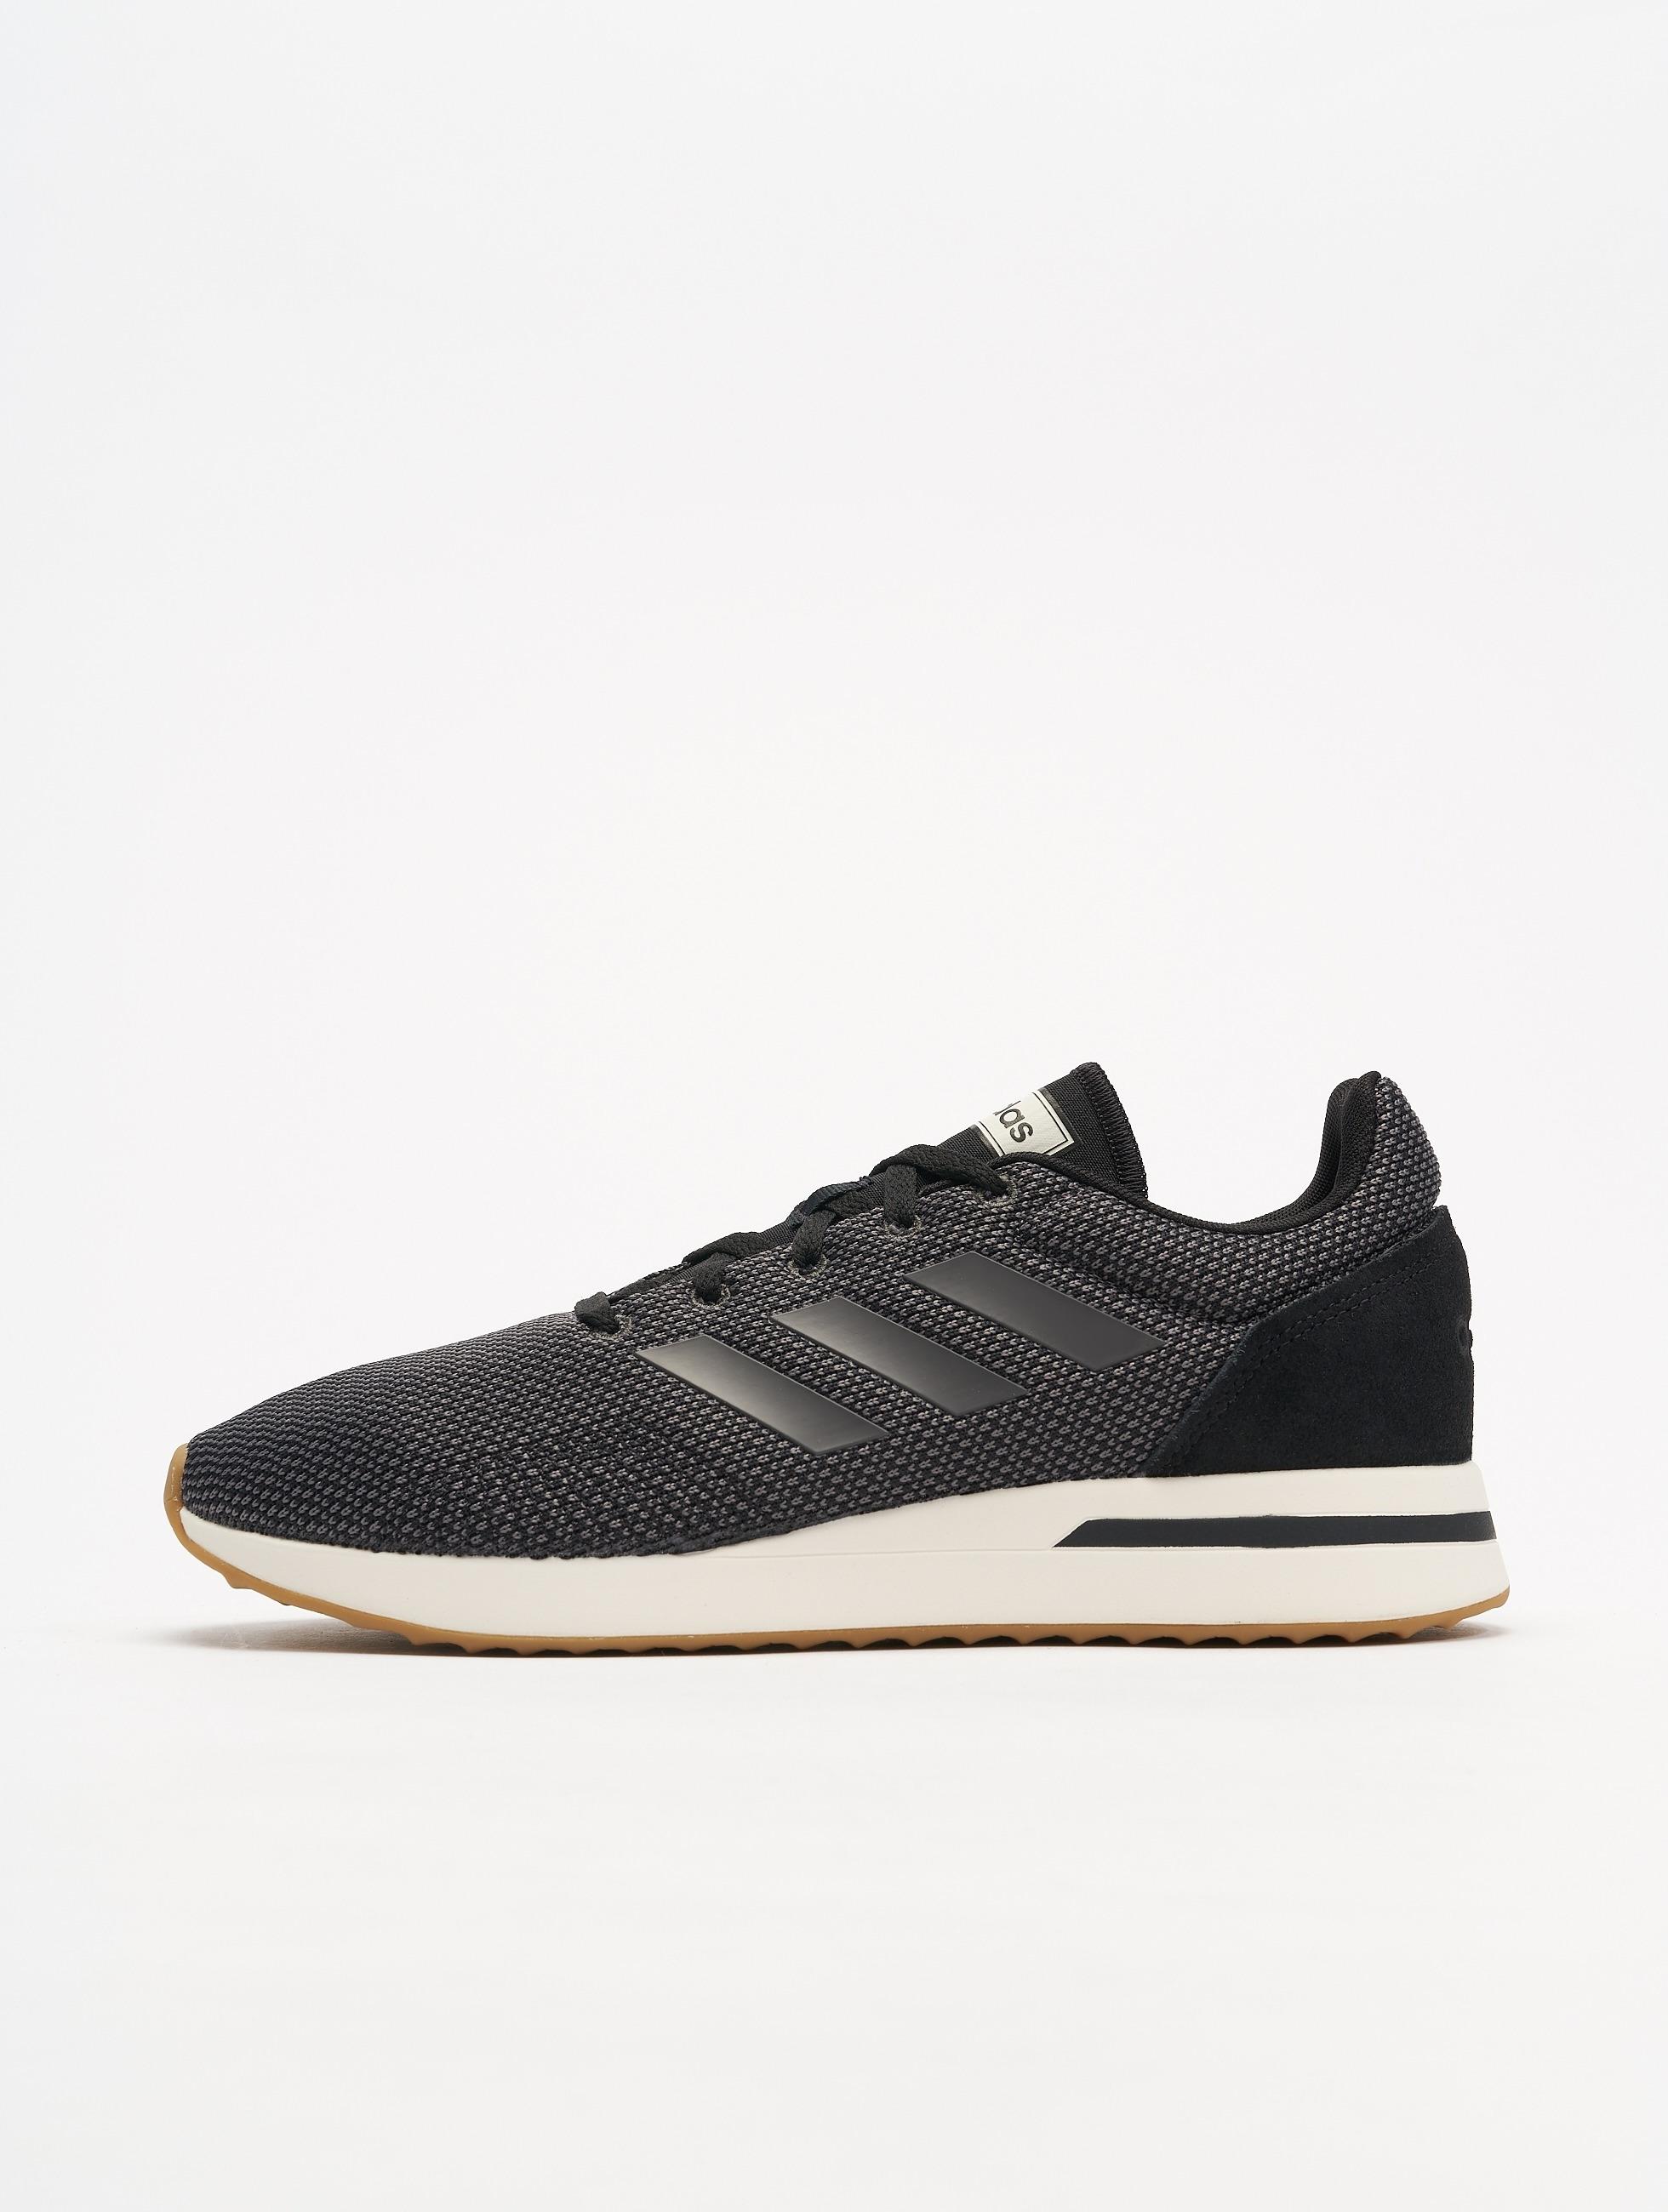 70s In 582329 Schoen Zwart Performance Run Sneaker Adidas vFPF7